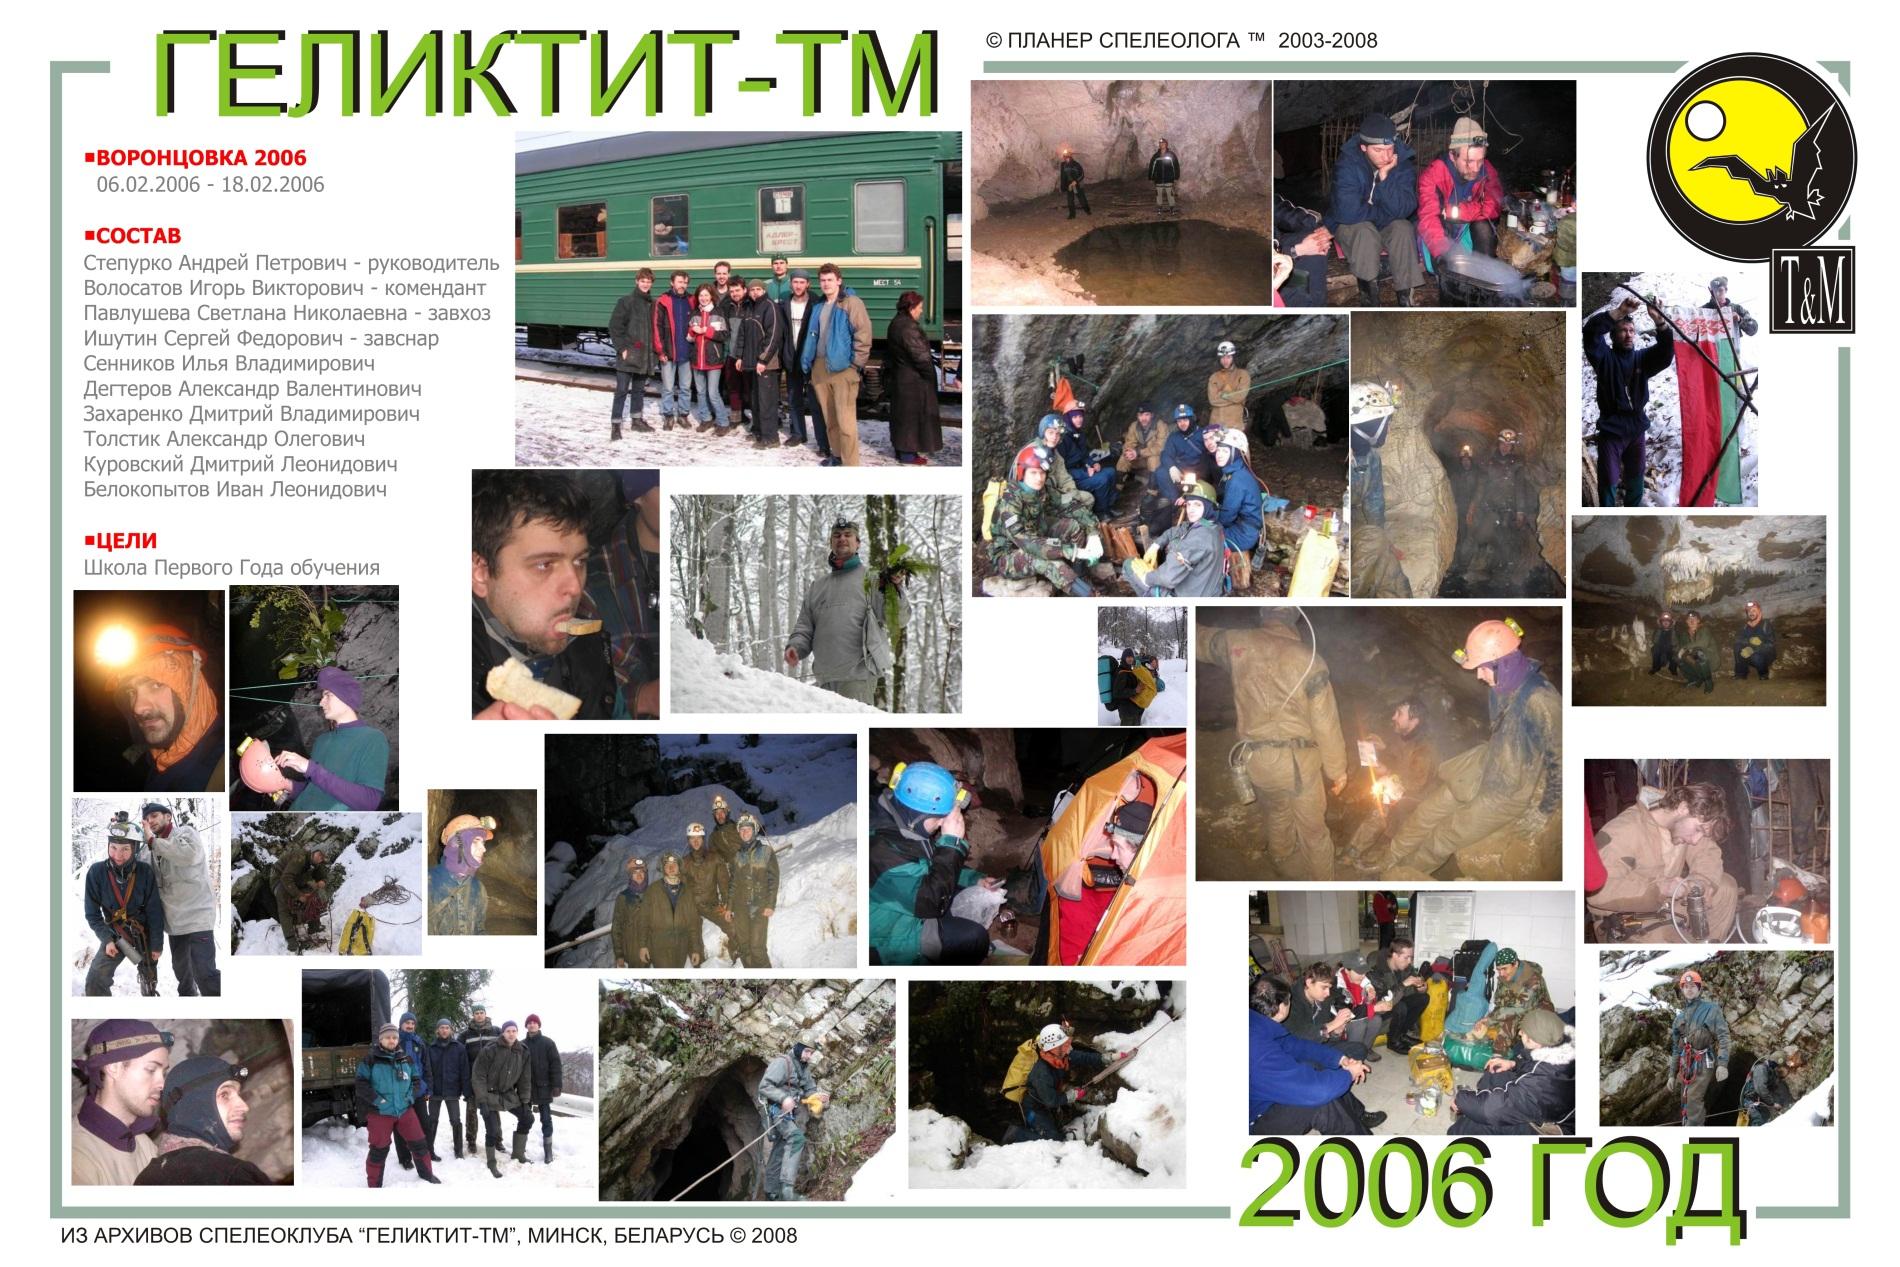 Воронцовка 2006 год